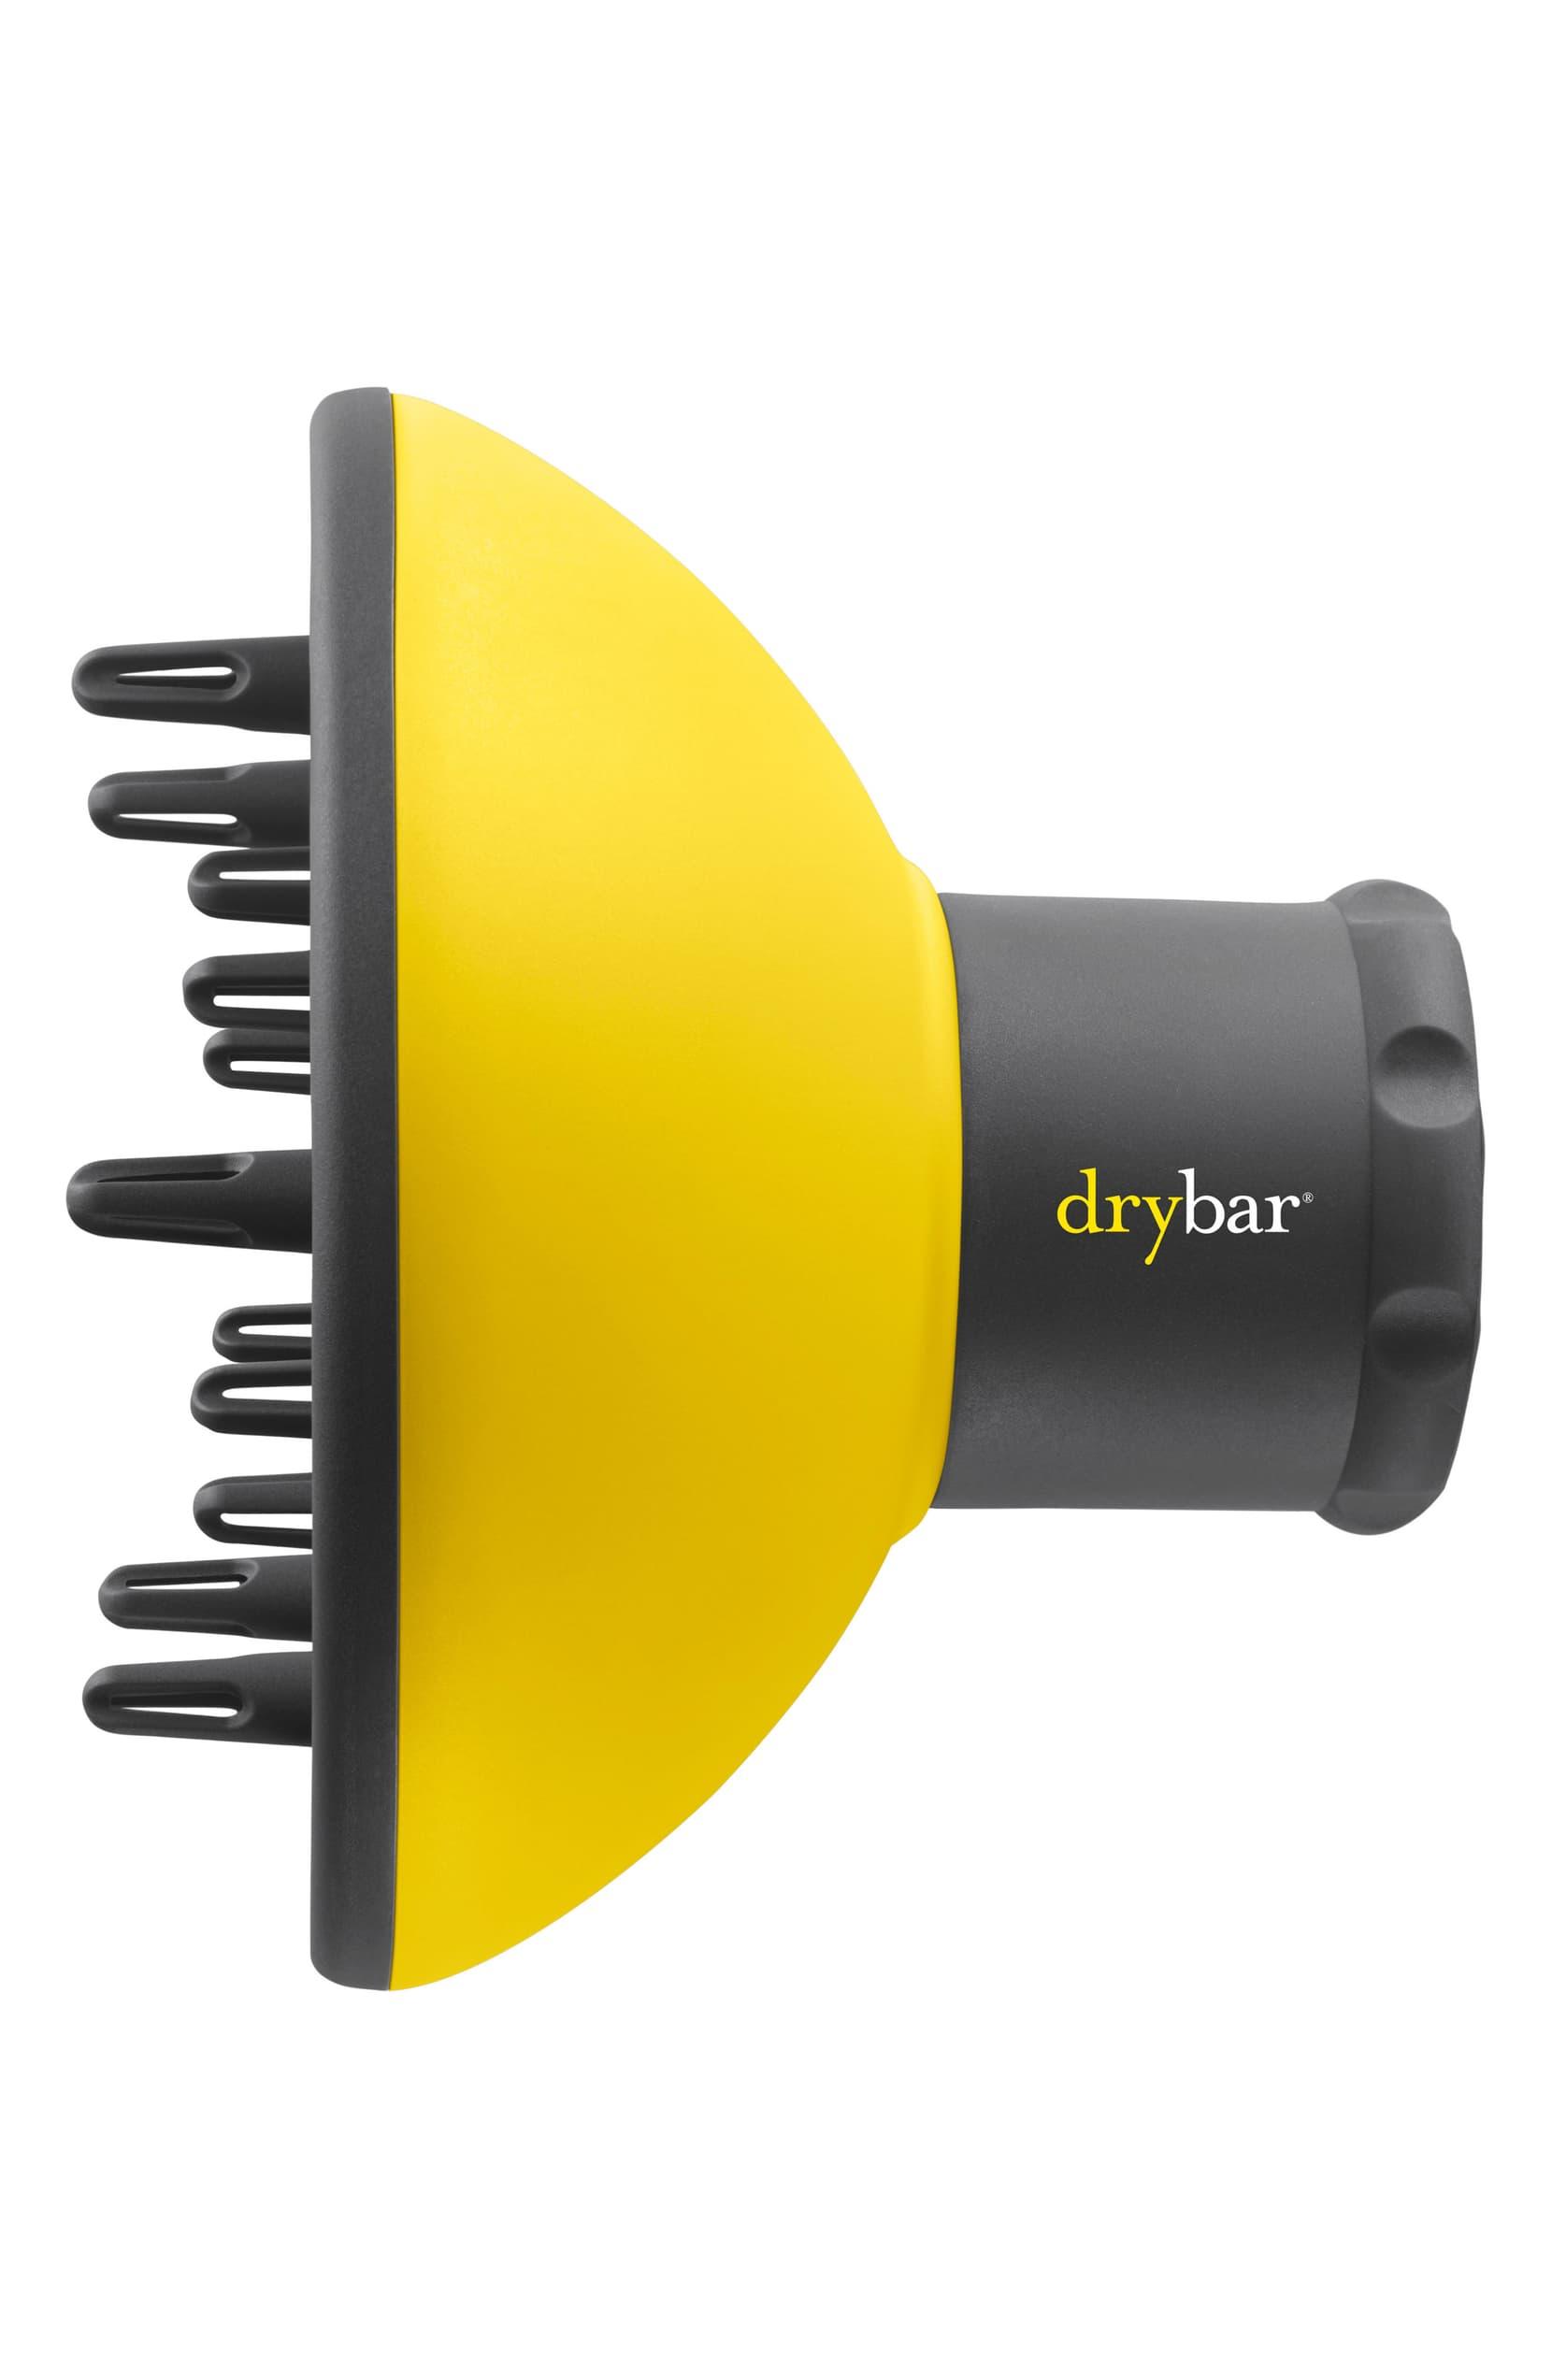 Drybar the Bouncer Universal Diffuser Attachment